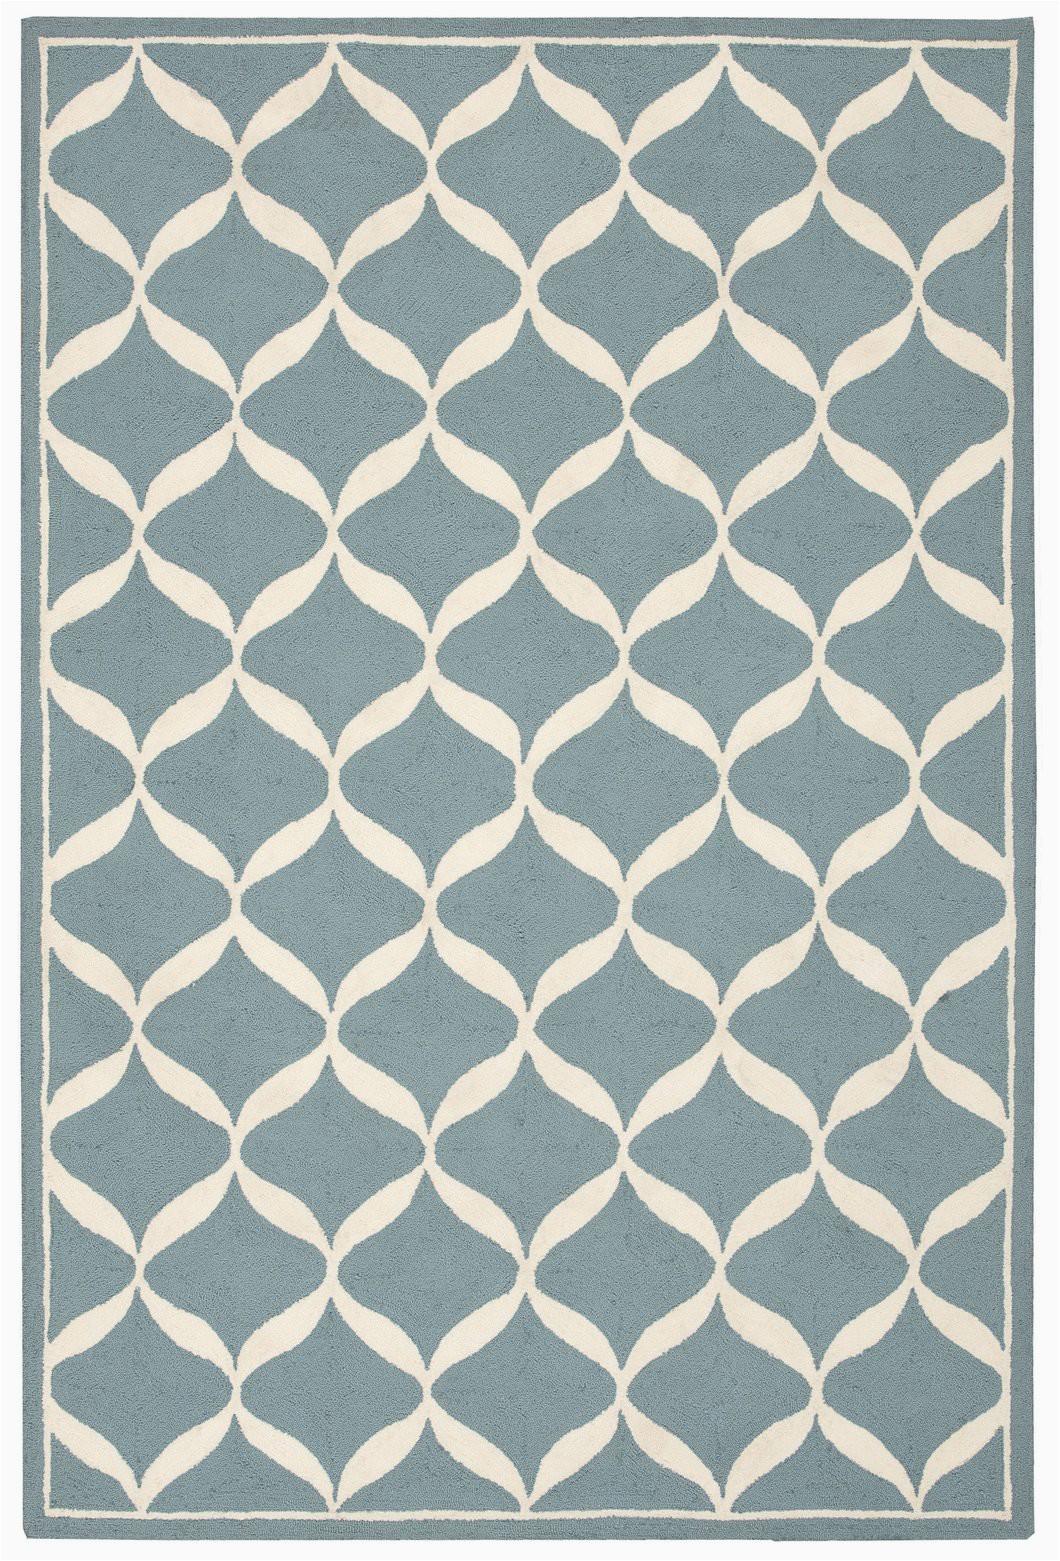 nourison decor aqua white area rug der06 aquwt rectangle